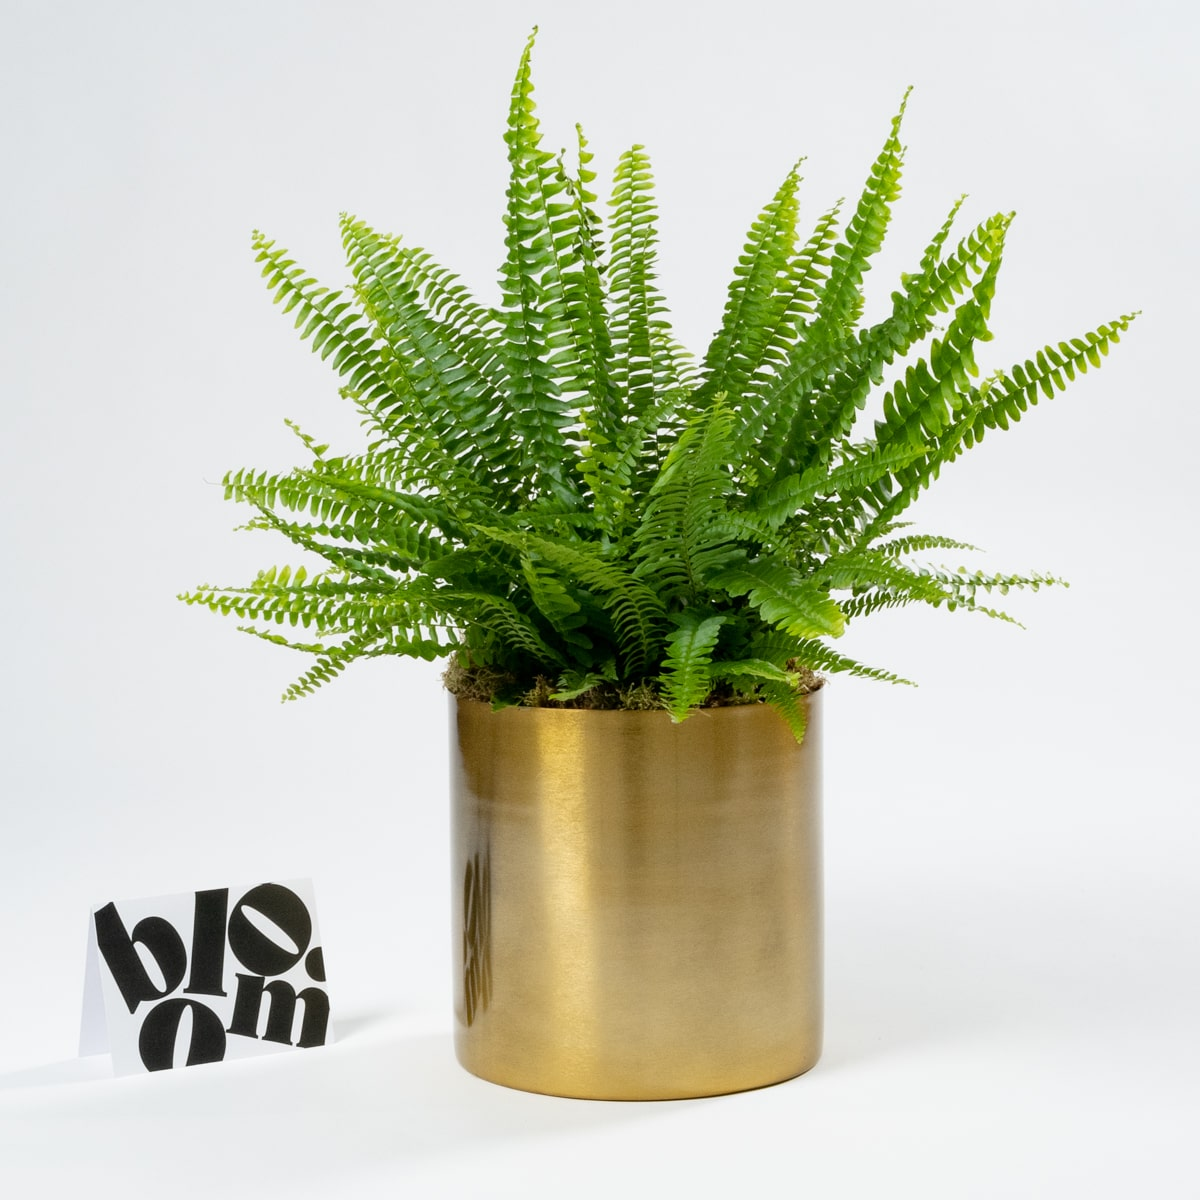 Bloom Flower Delivery | Flash Sale: Tall Brass Plant Pot & Vase